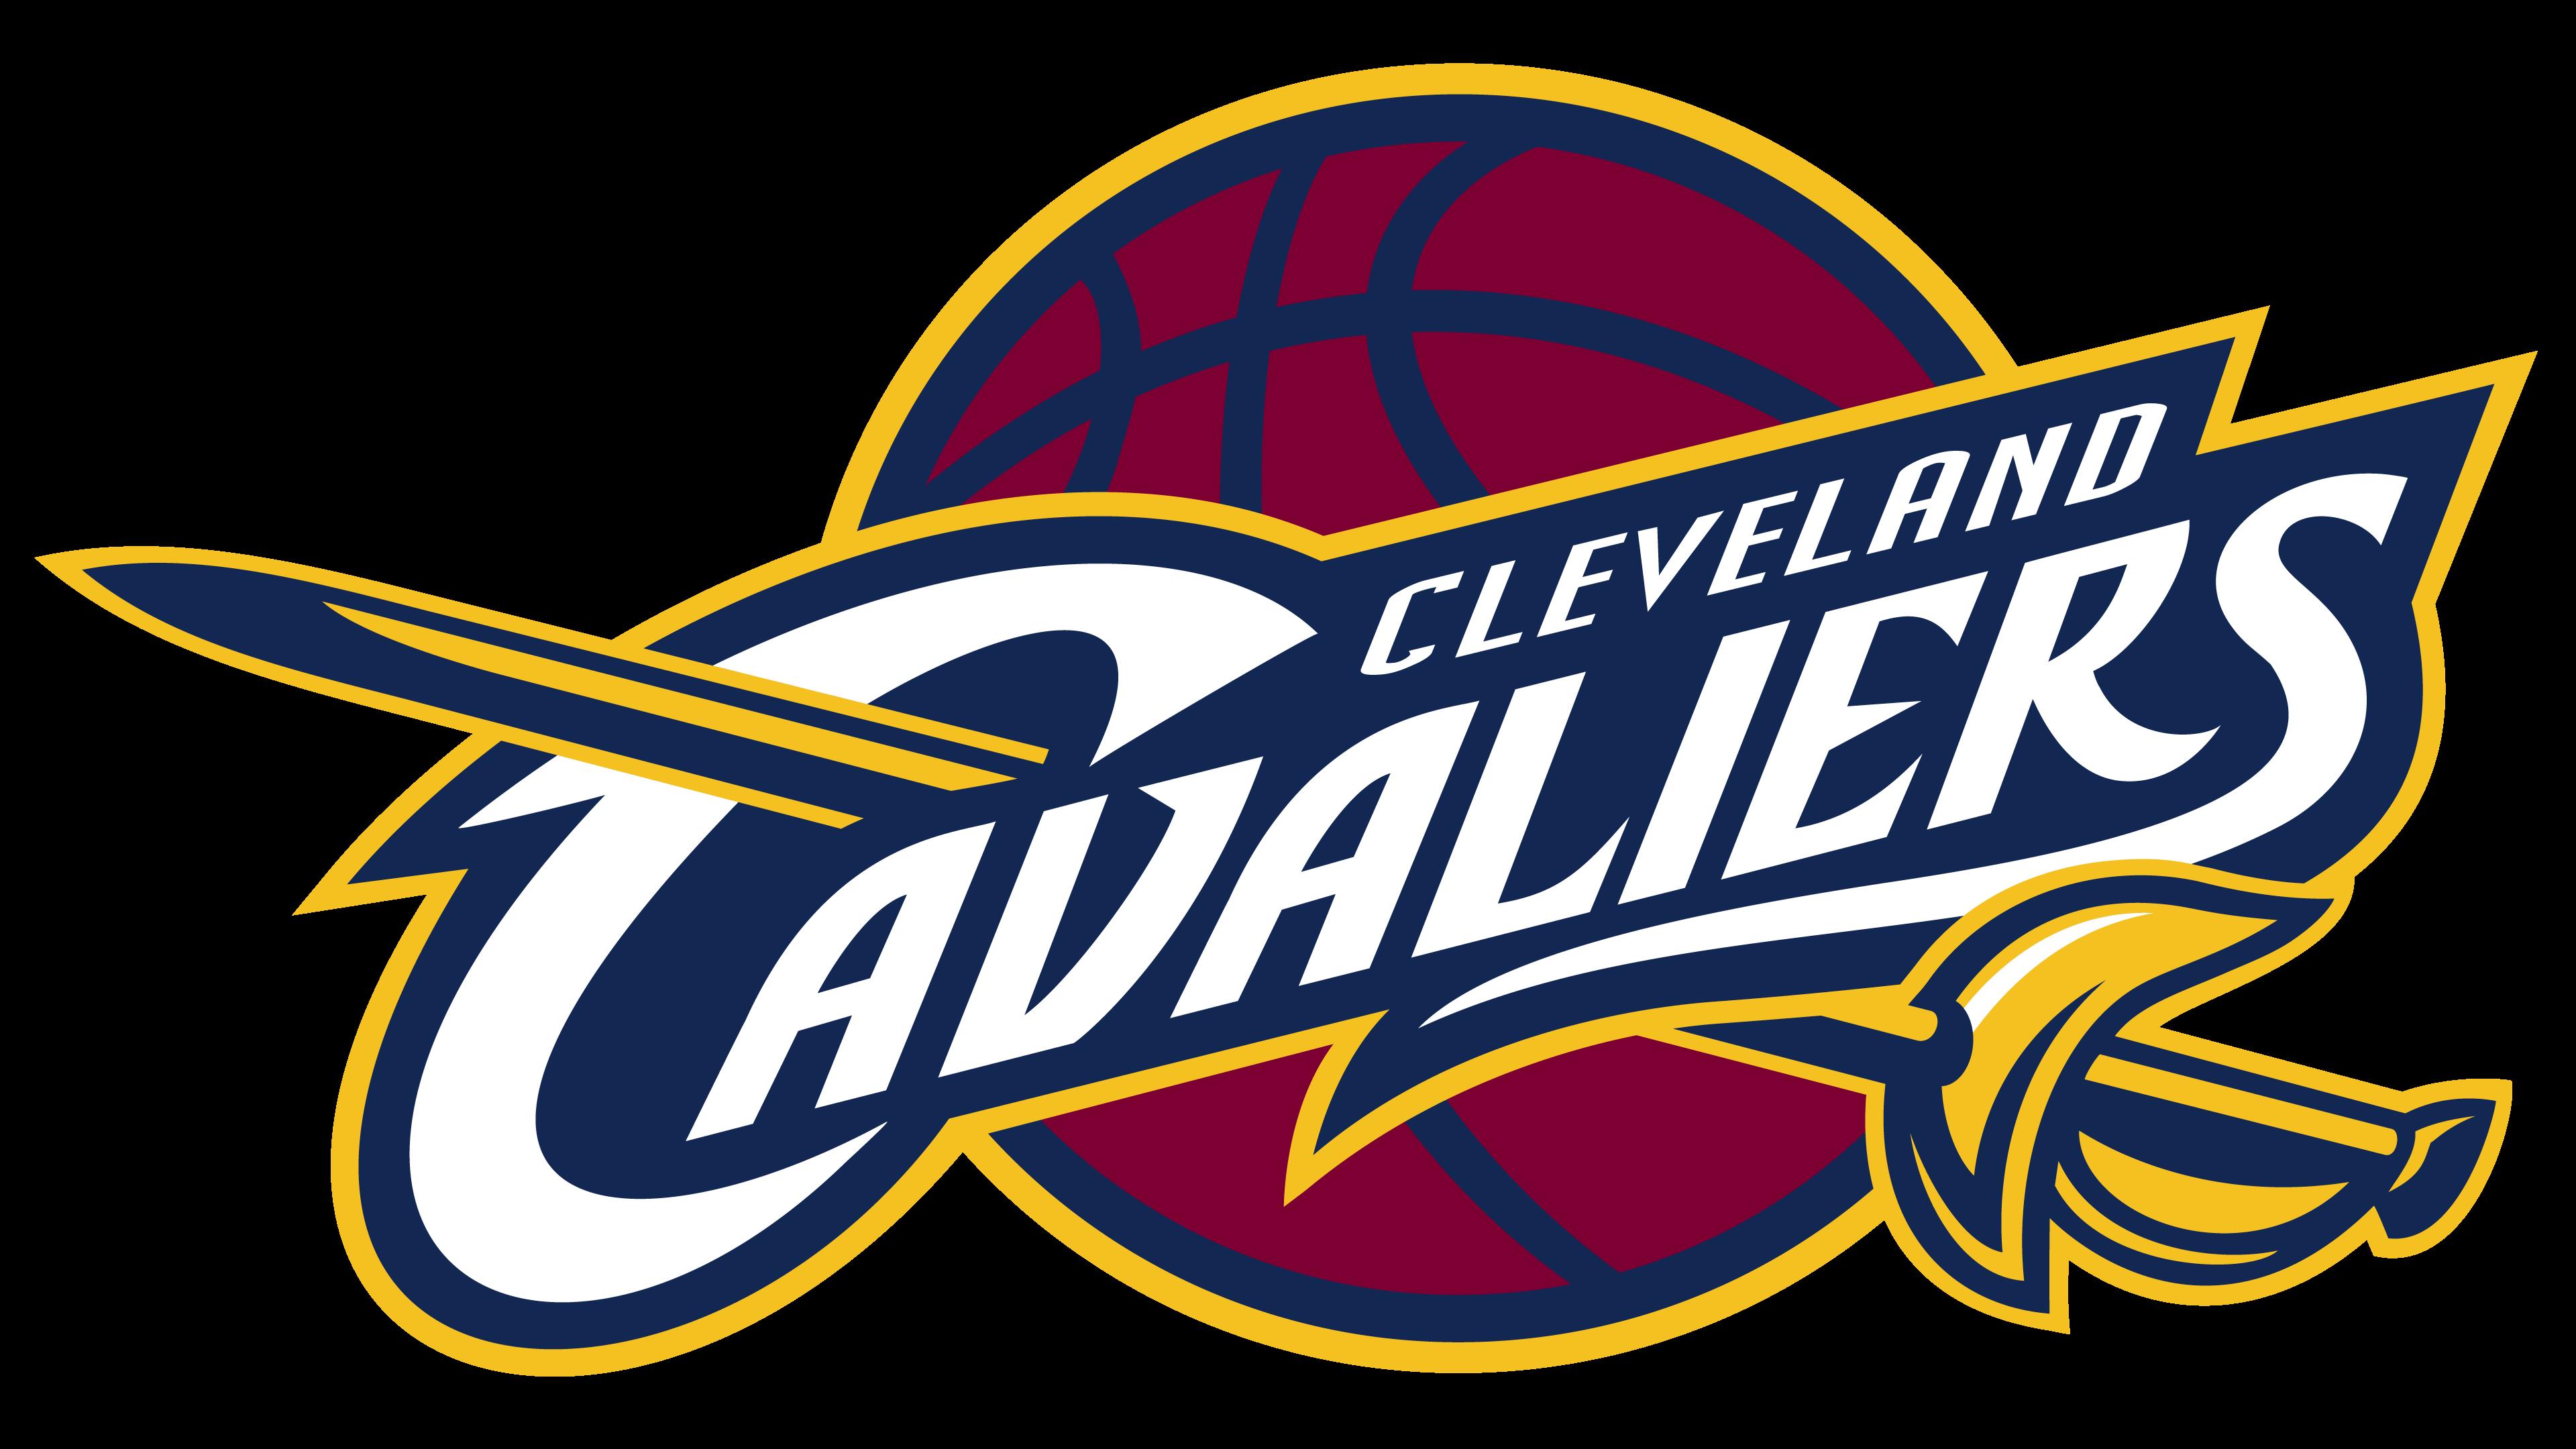 Cleveland Cavaliers logos.